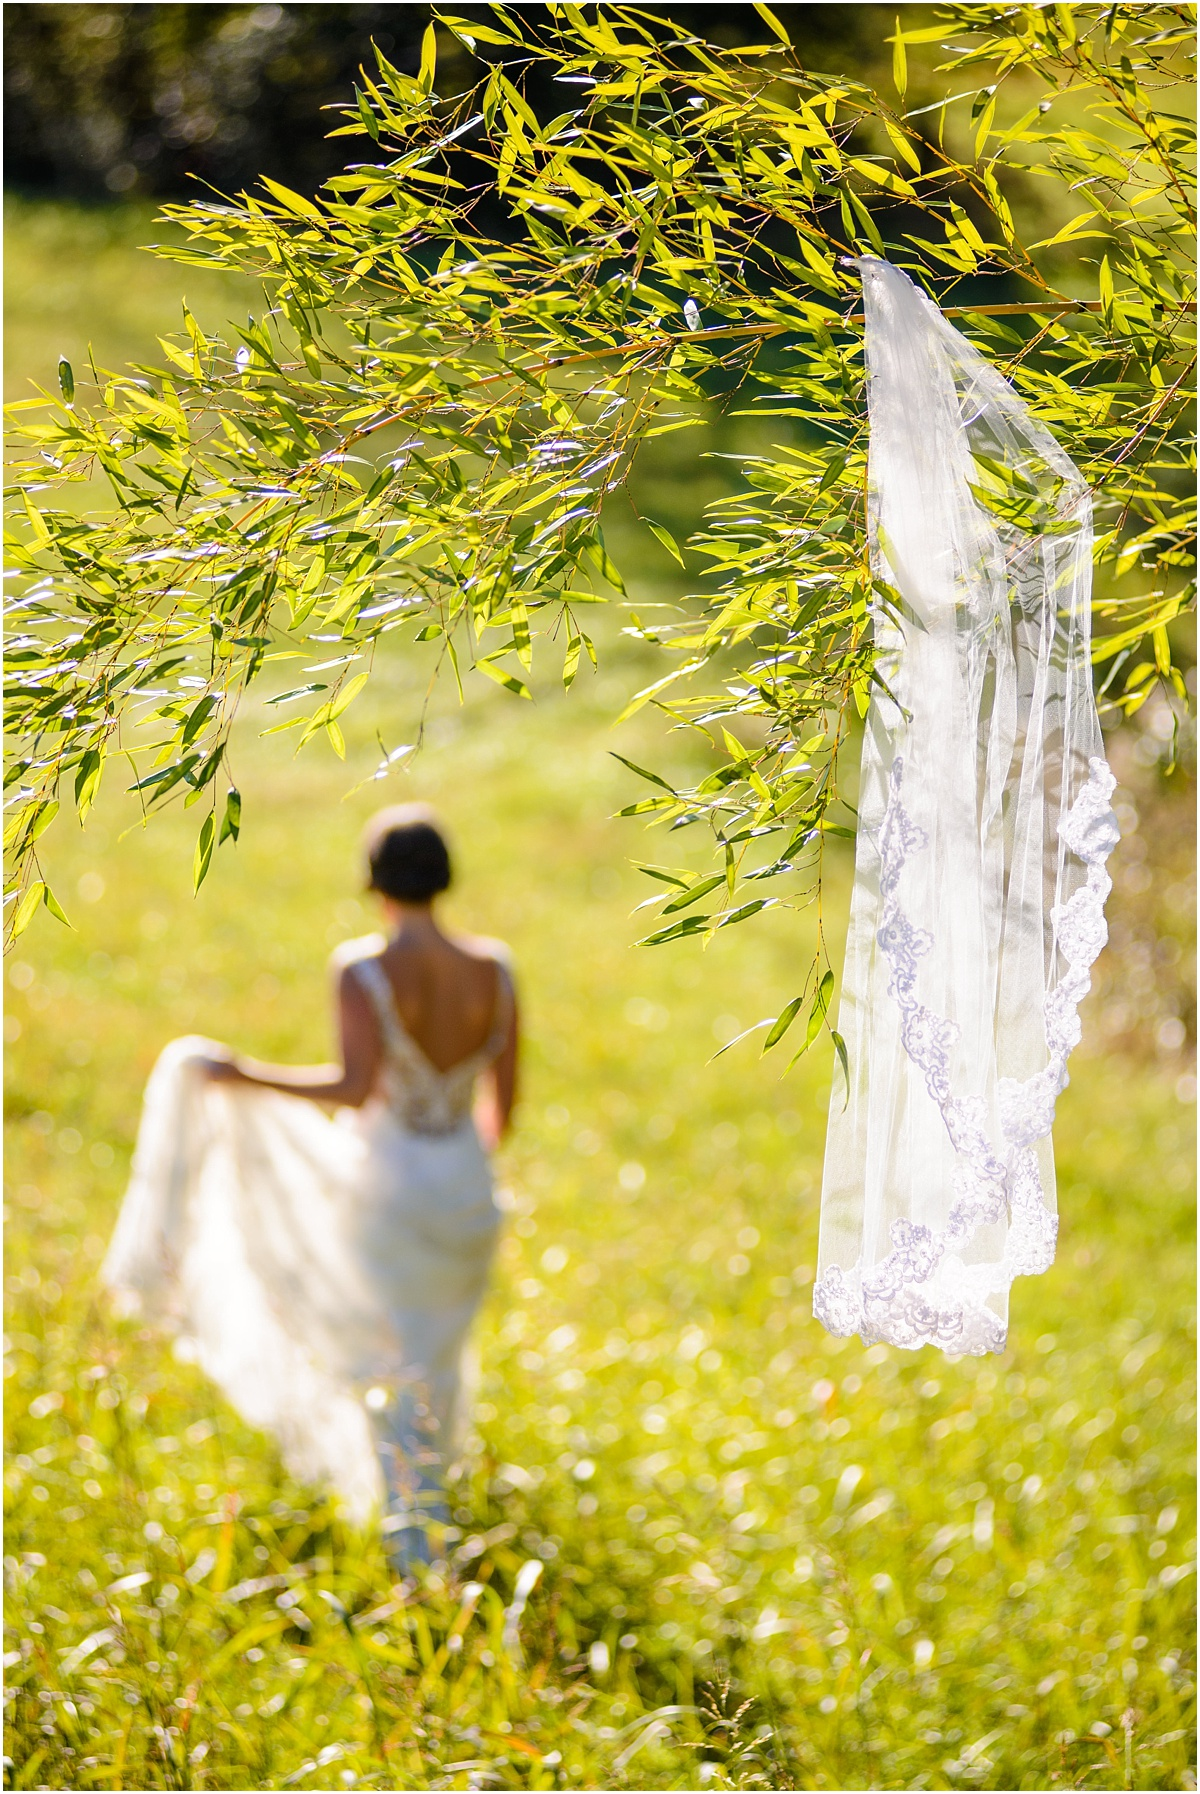 Greg Smit Photography Nashville wedding photographer Tomlinson Family Farm_0010